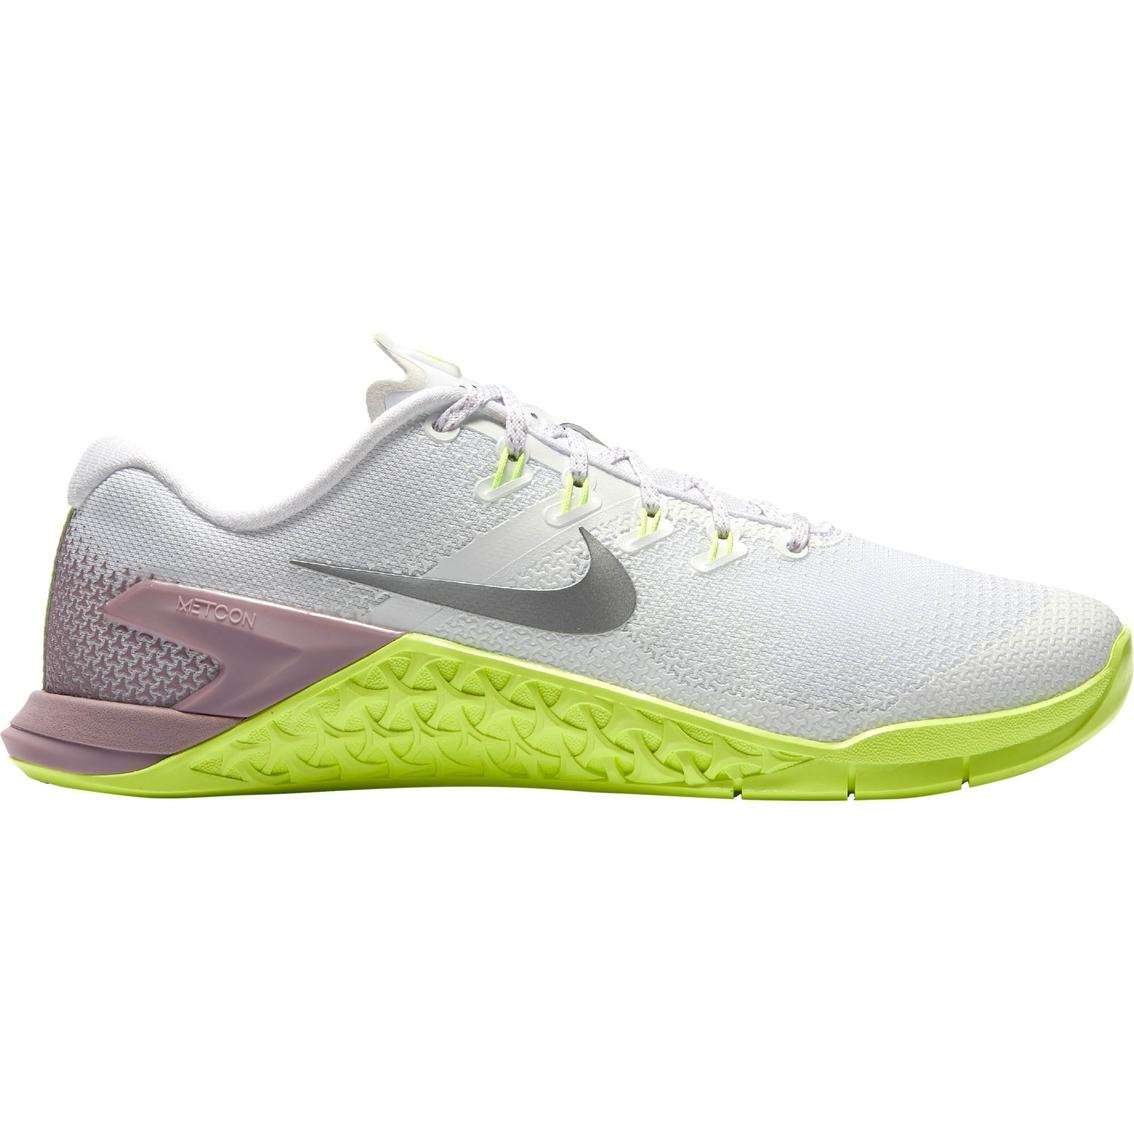 b82d0b71a10c Nike Women s Metcon 4 Cross Training Weightlifting Shoes